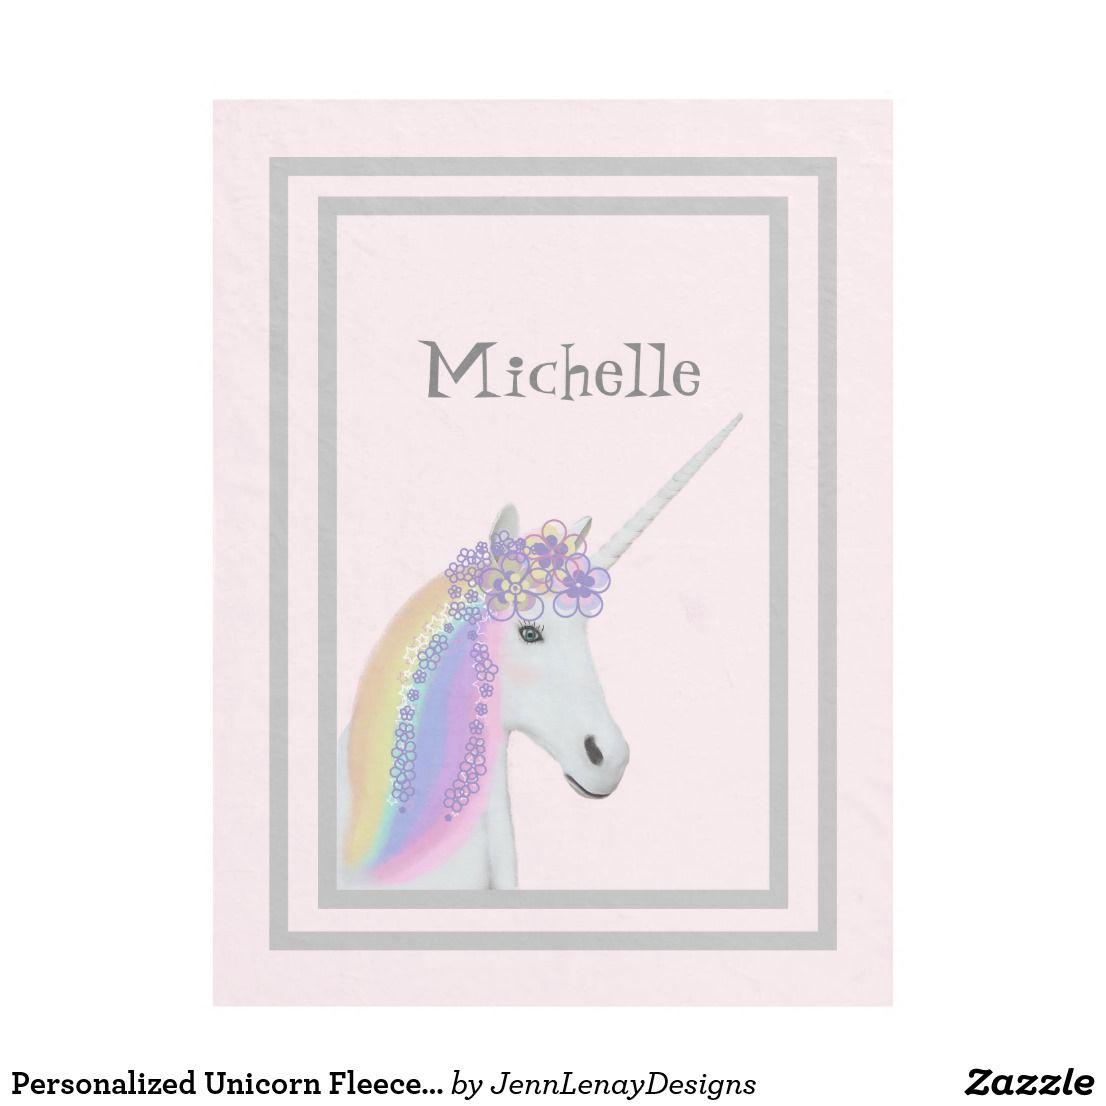 Personalized Unicorn Pastel Pink Kids Fleece Blanket #unicornblankets #unicorns #pink #pastel #customized #cuteunicorns #Design #JennLenayDesigns #Zazzle